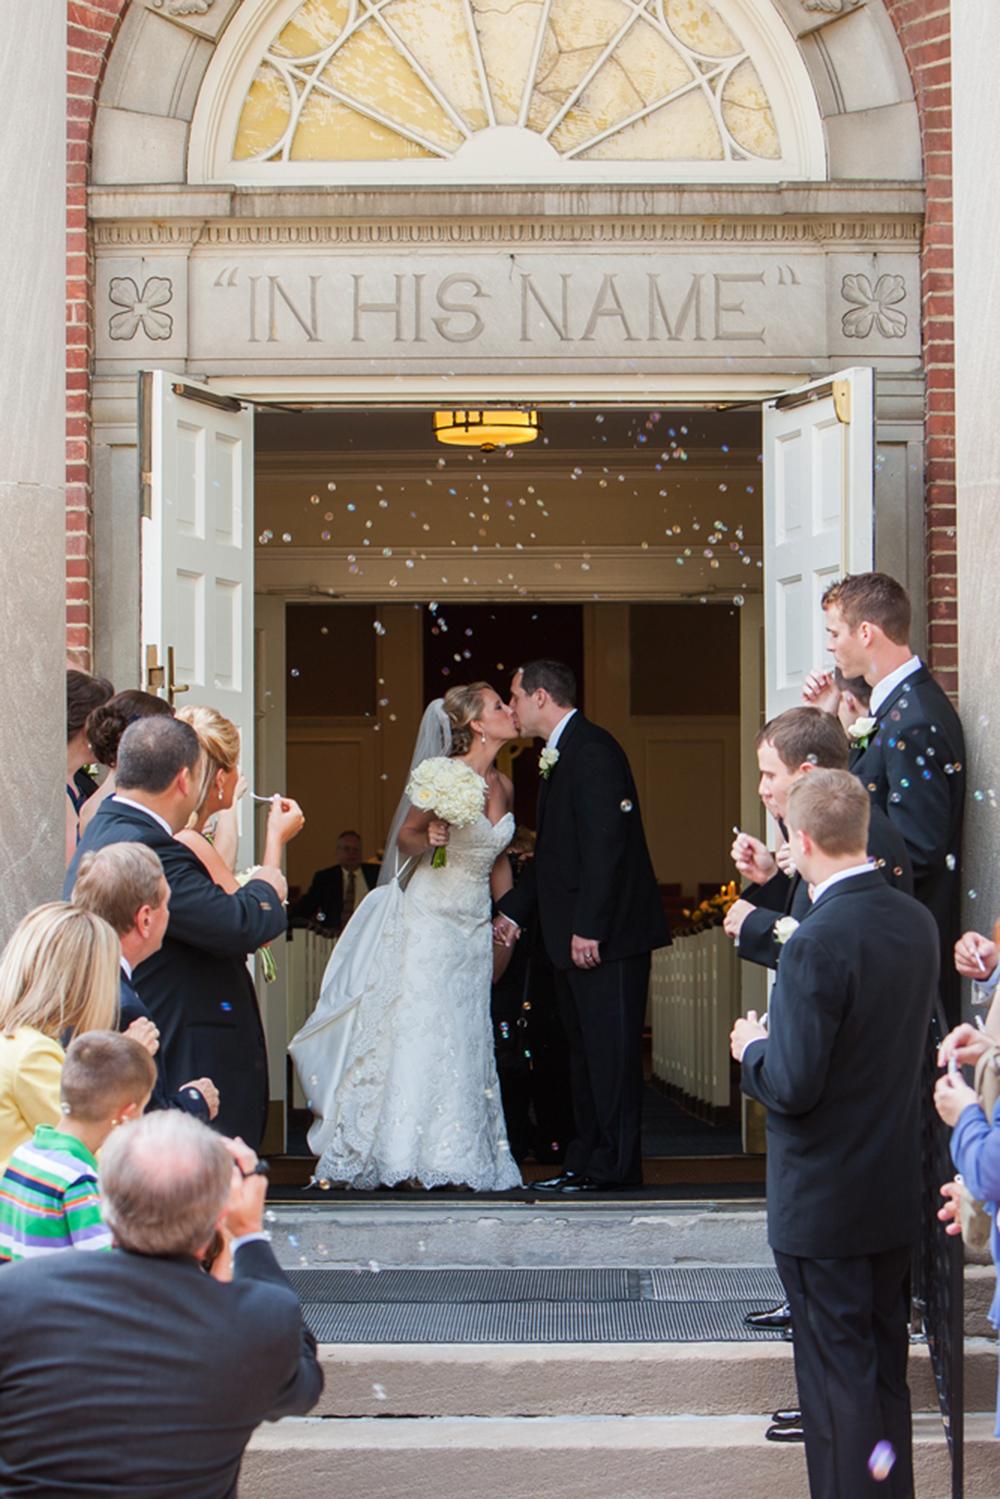 Jodi Warner & Ryan Hughes wedding